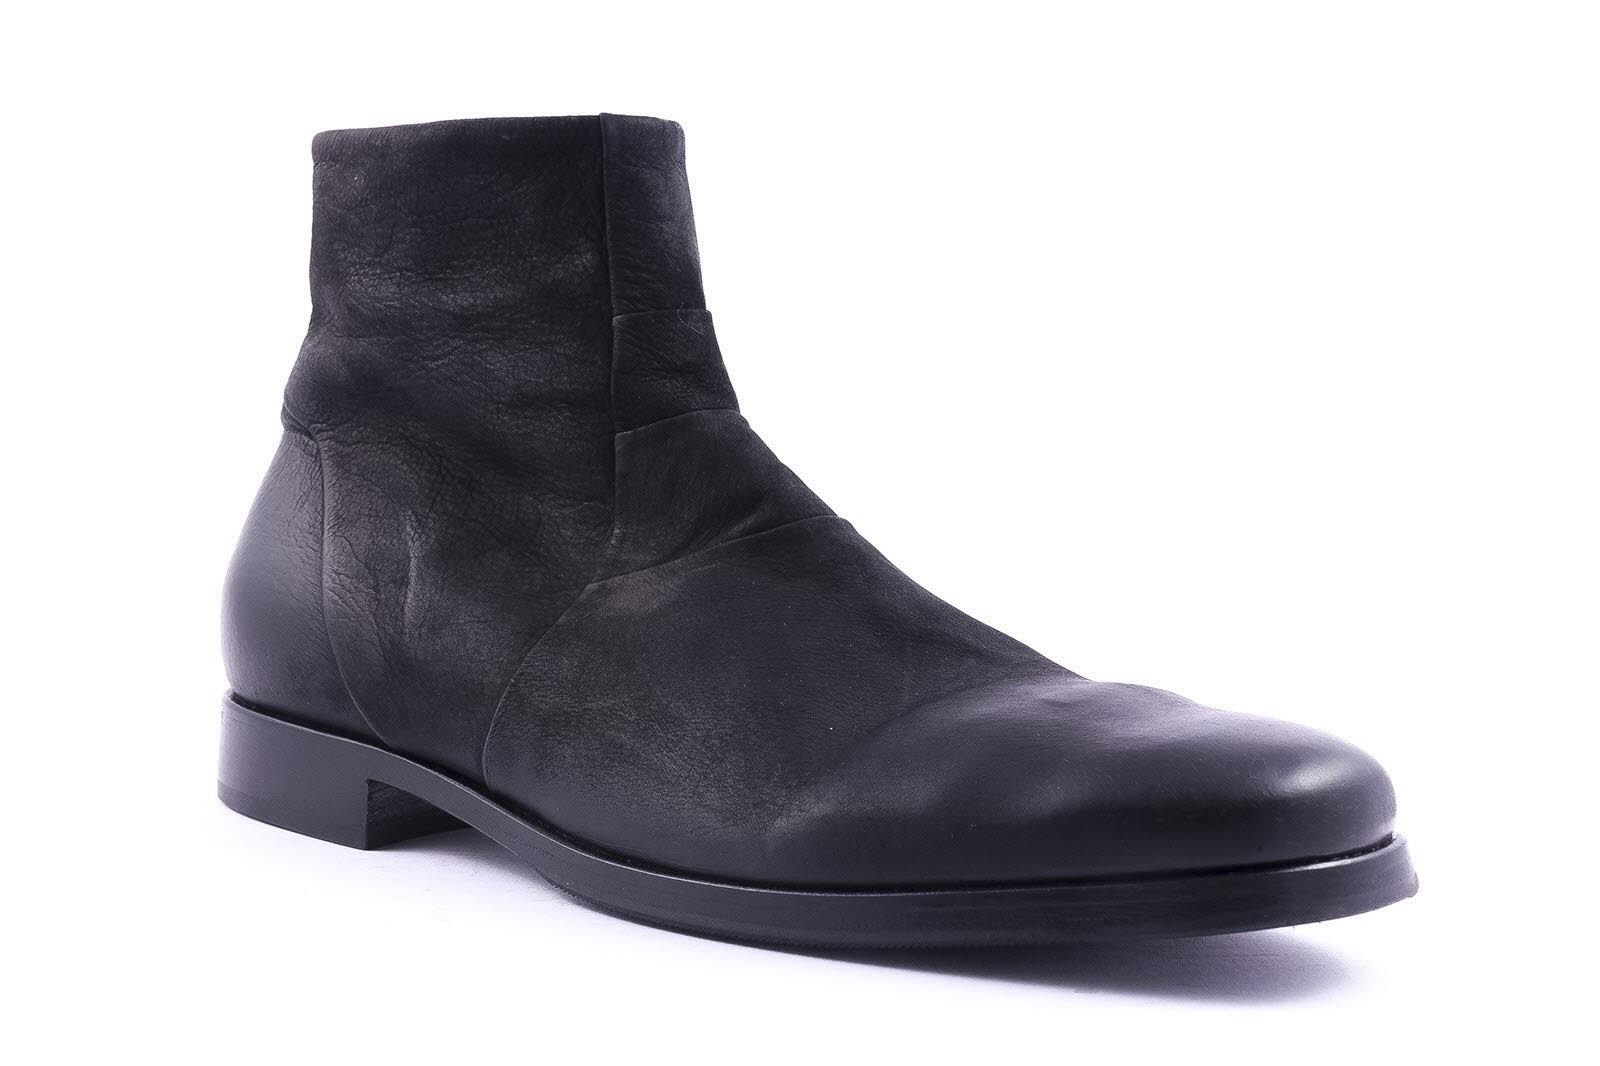 sale retailer 02f00 4b140 Alexander Hotto 50026 Nero